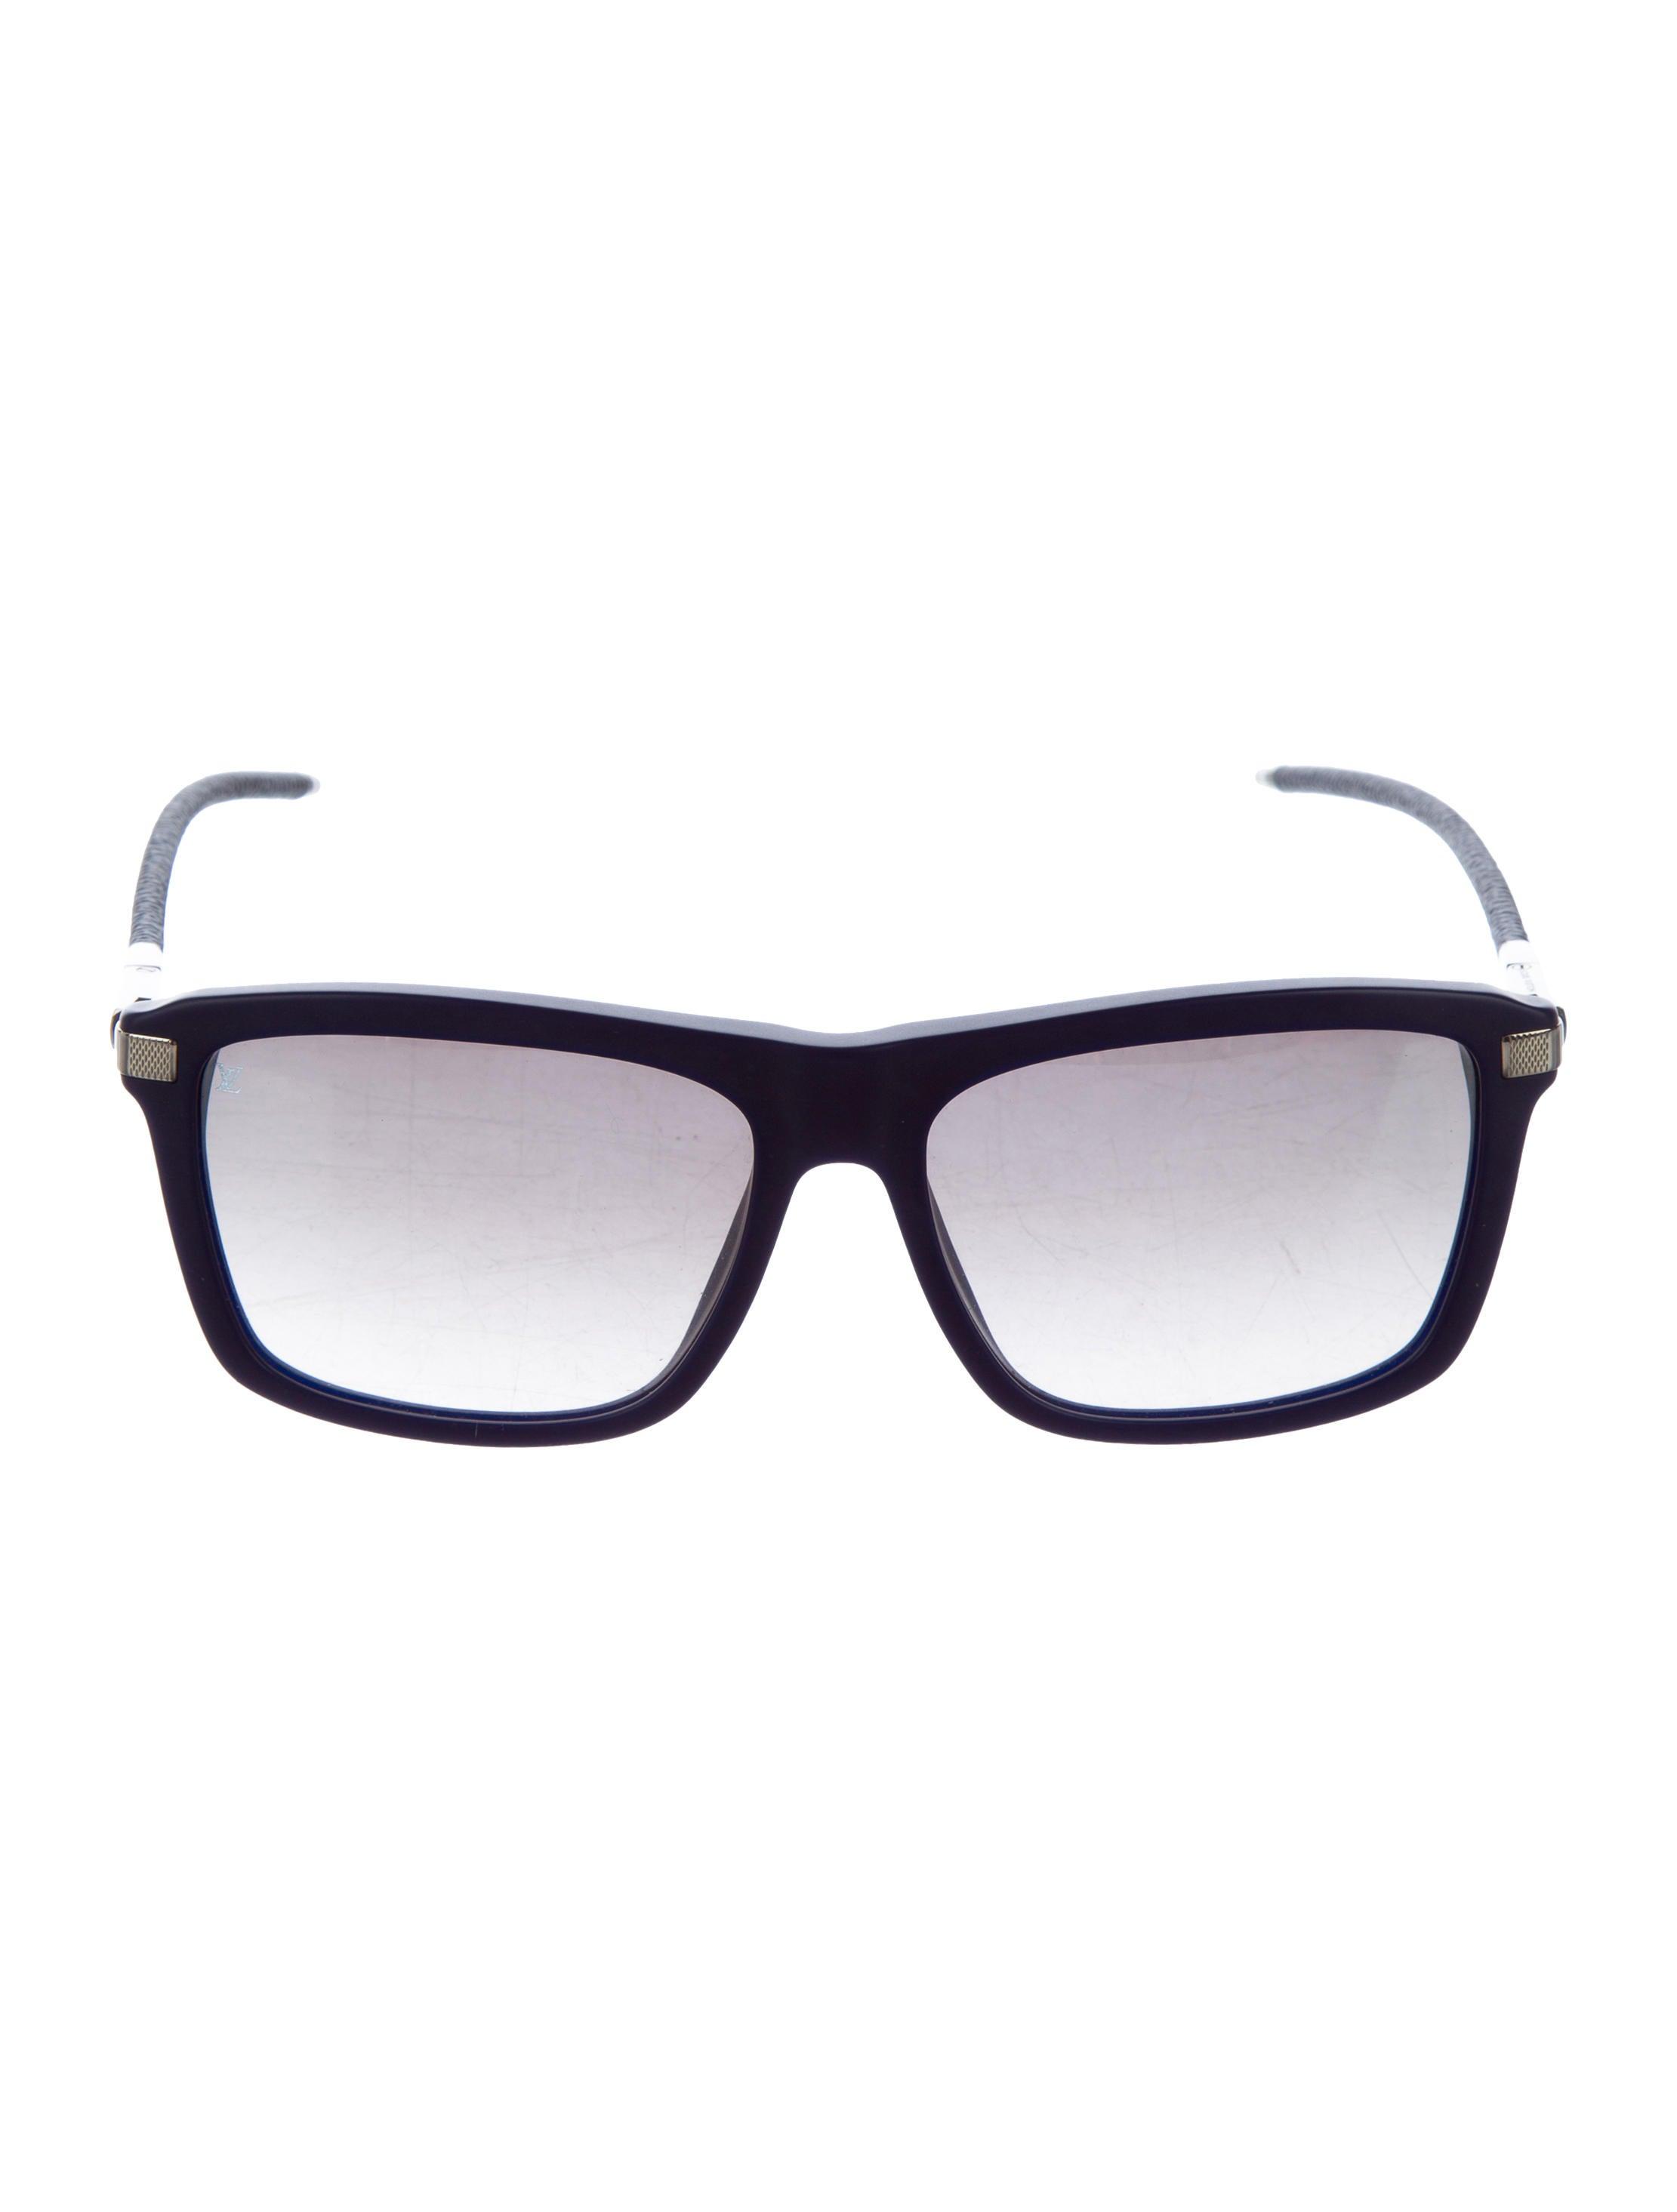 d2bebed9a3f Louis Vuitton 2016 Alliance Foldable Sunglasses - Accessories ...